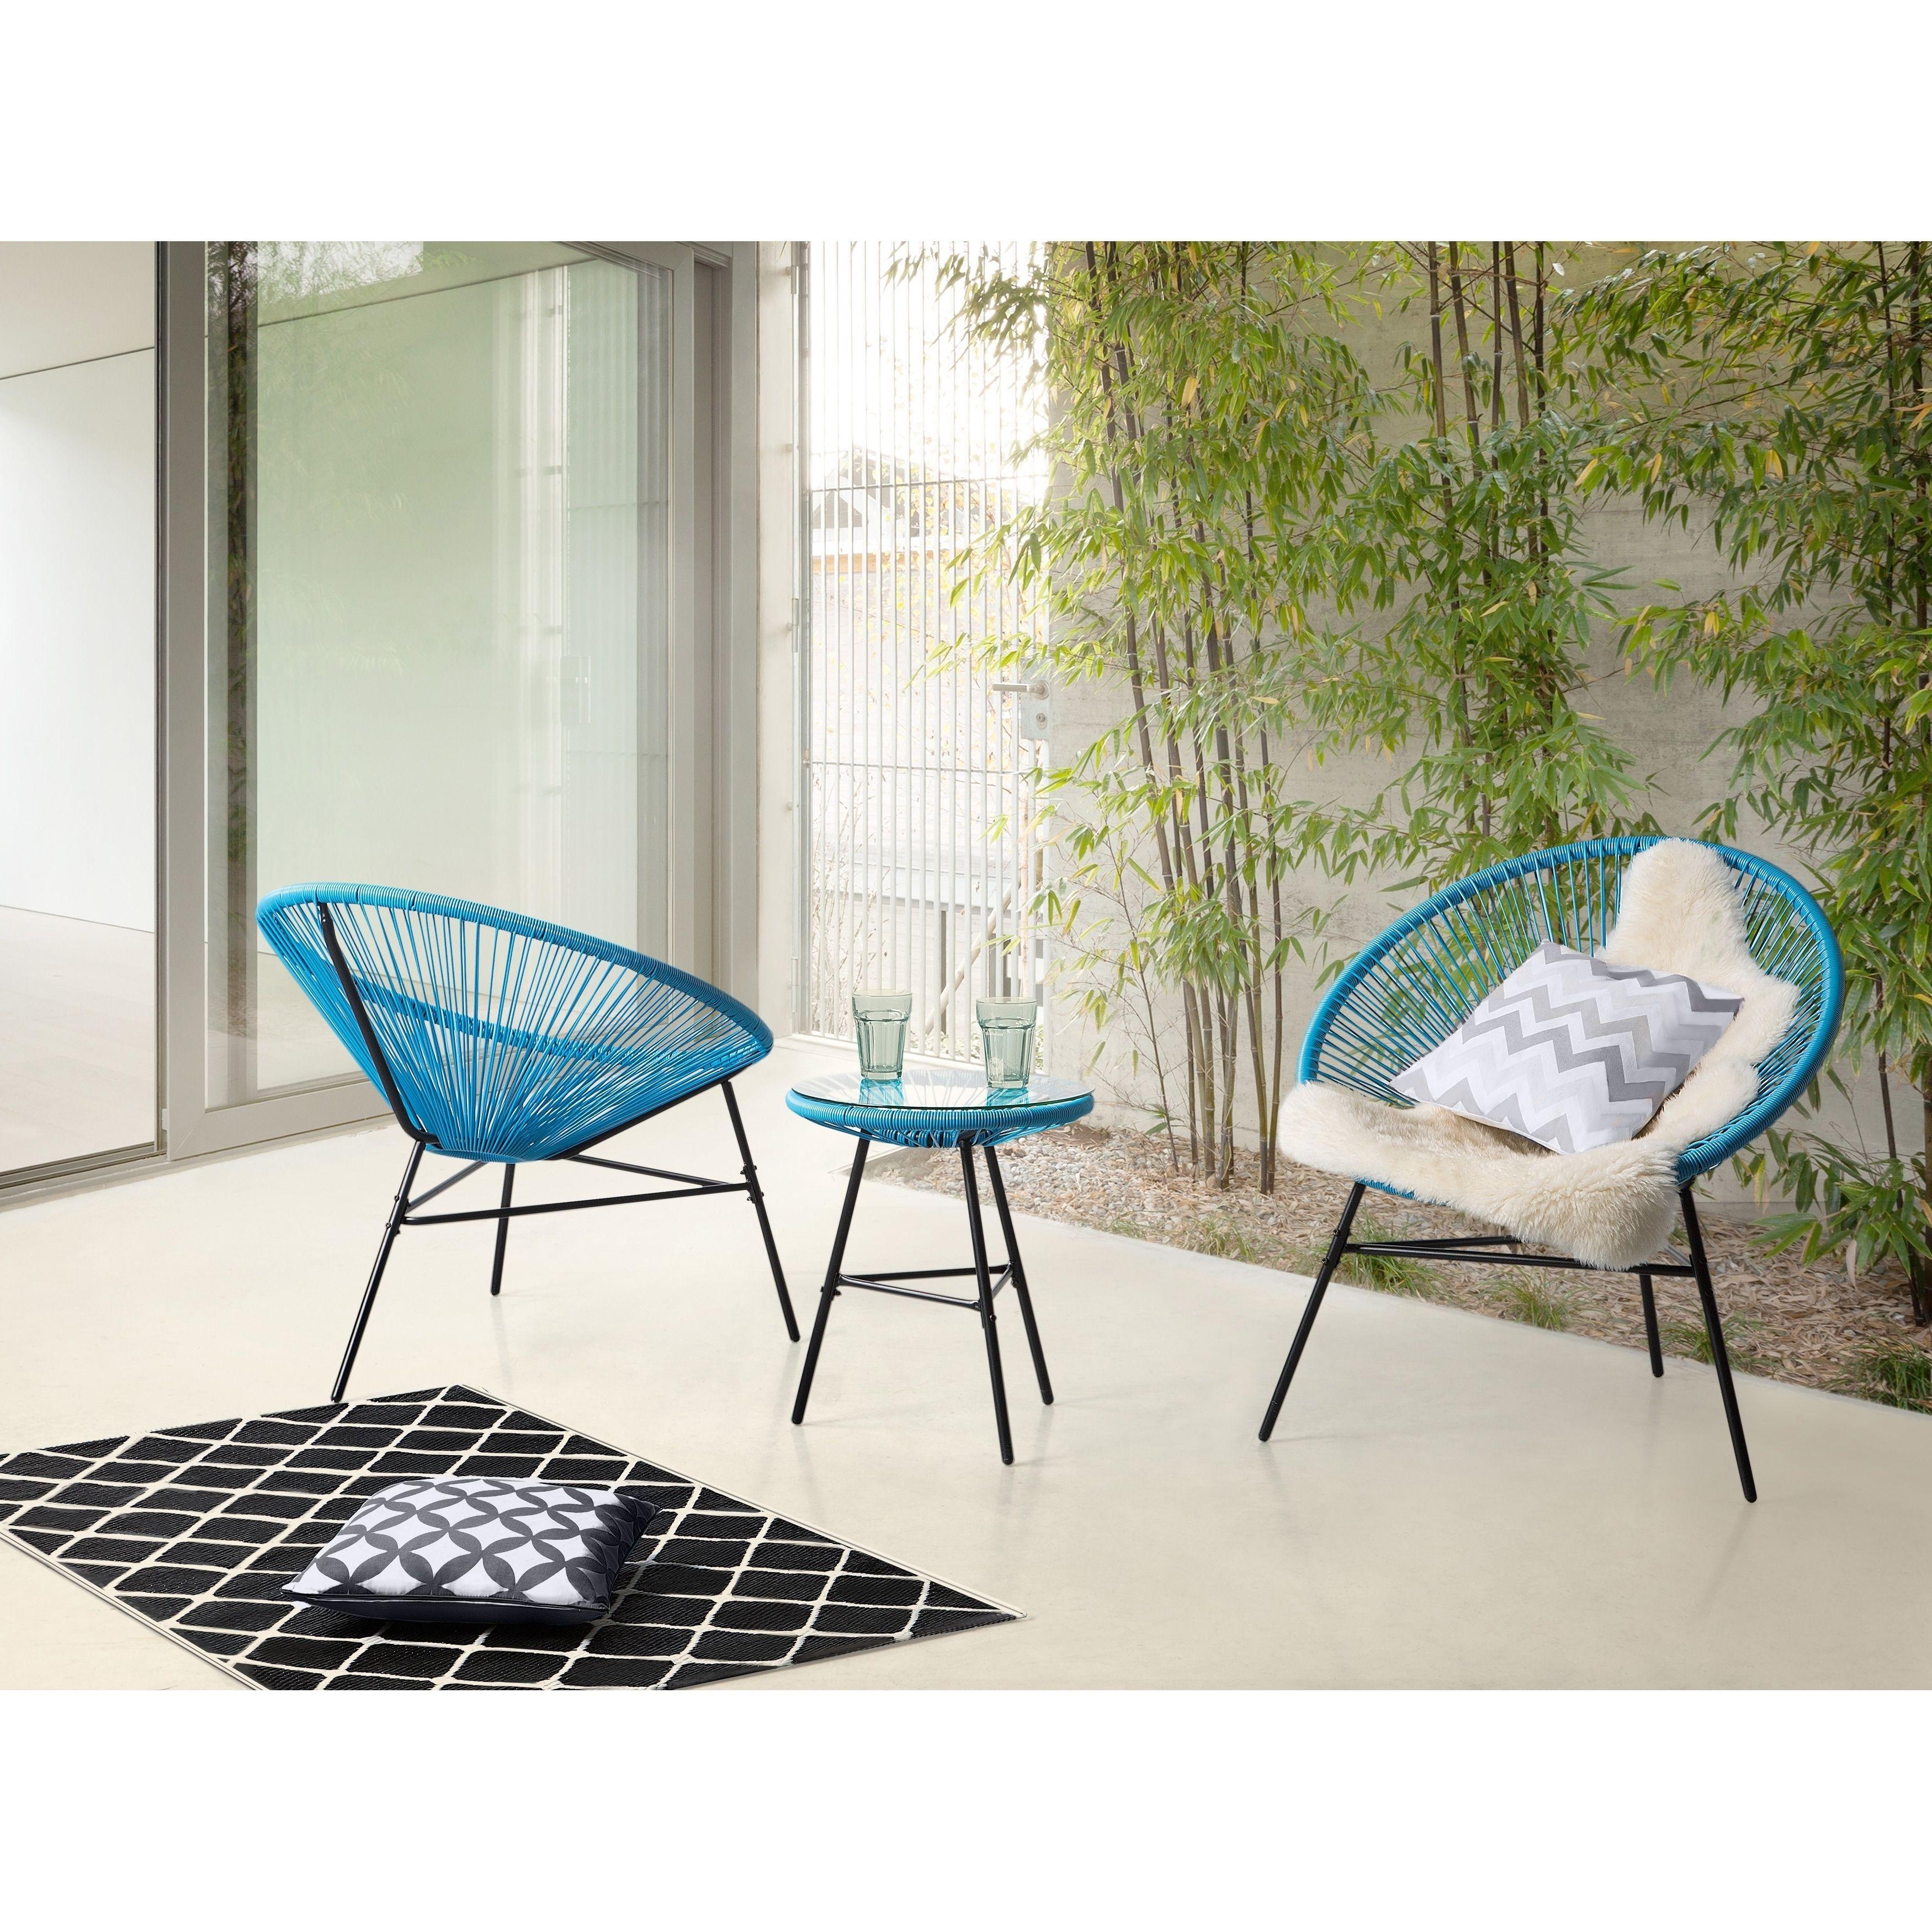 Beliani Patio Bistro Set Blue Acapulco Patio Furniture Synthetic